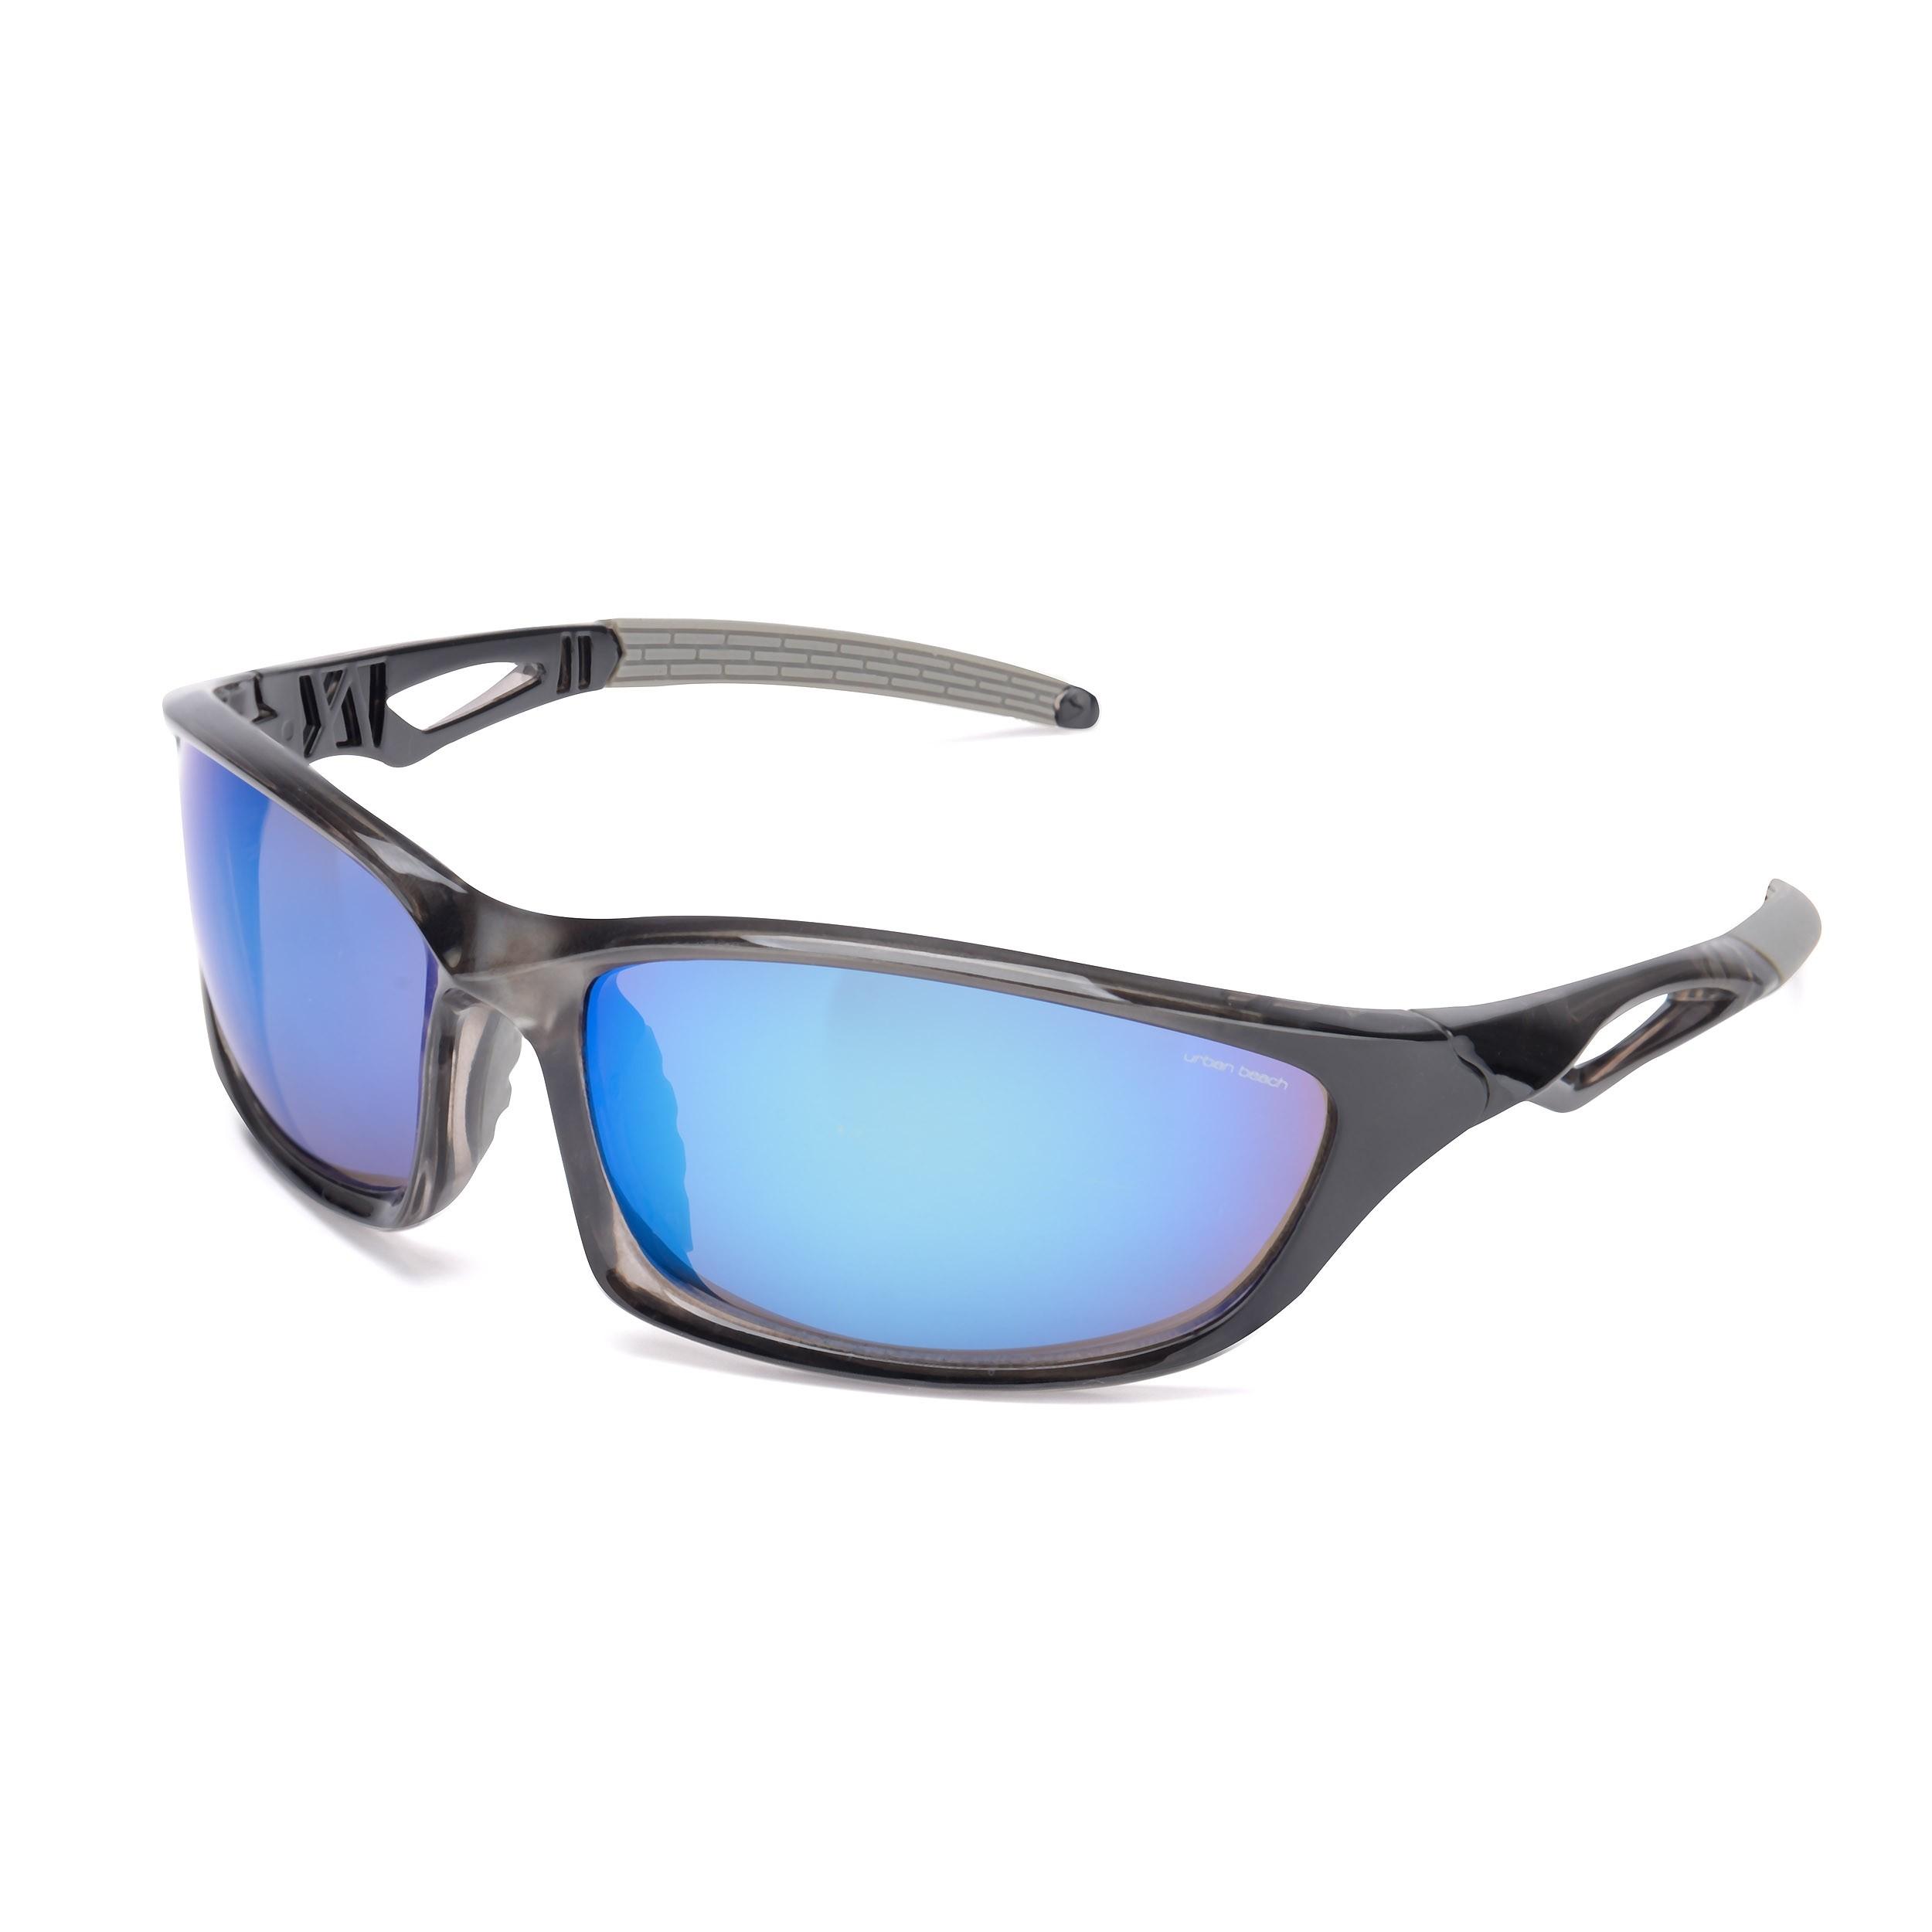 2b6e4317c Mens Transition Wraparound Sunglasses Black - Sunglasses - Accessories -  Mens